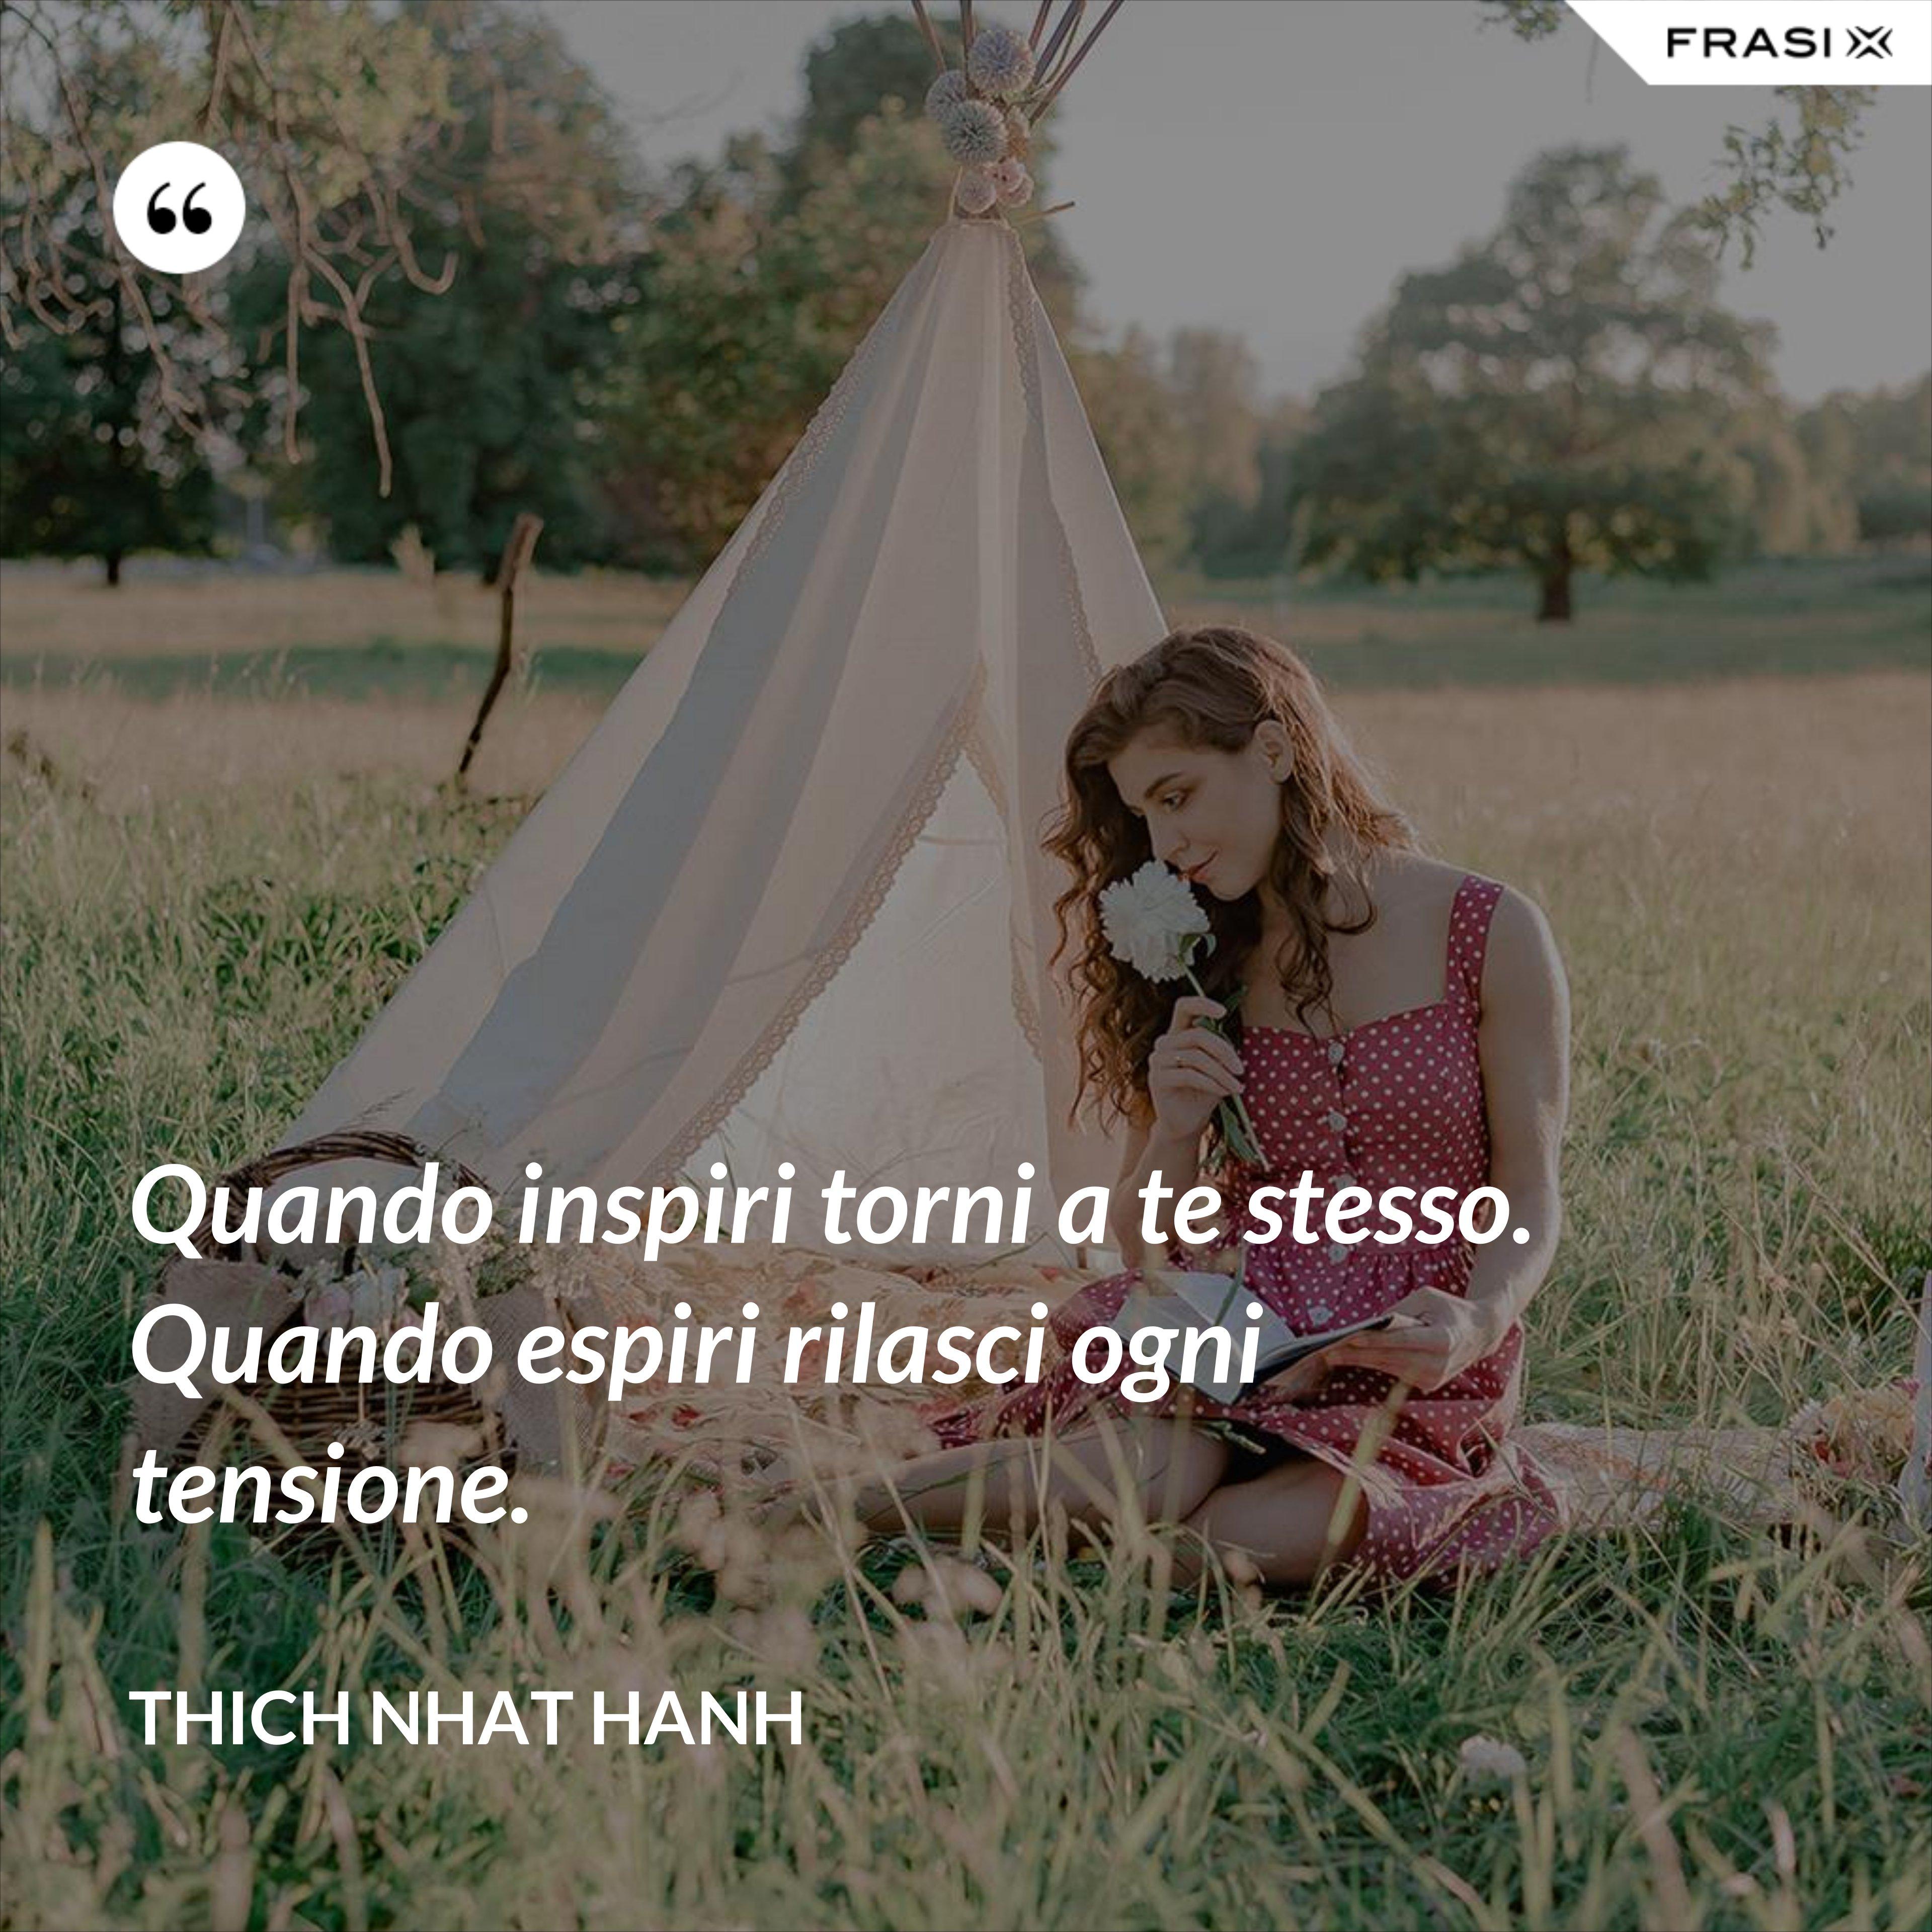 Quando inspiri torni a te stesso. Quando espiri rilasci ogni tensione. - Thich Nhat Hanh